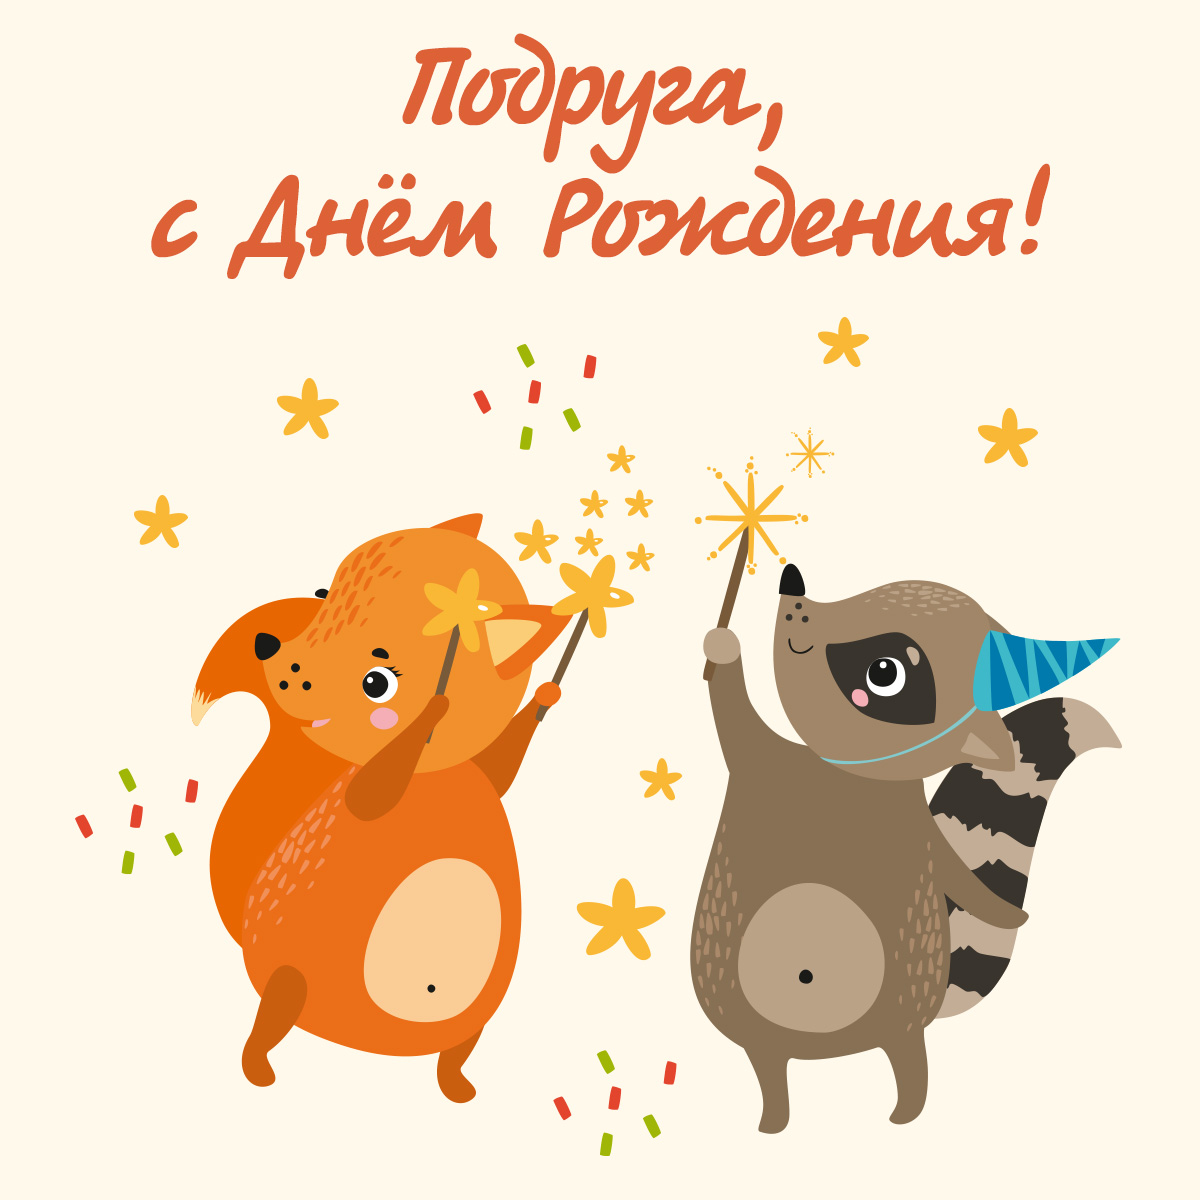 Енот и лиса поздравляют с днем рождения.